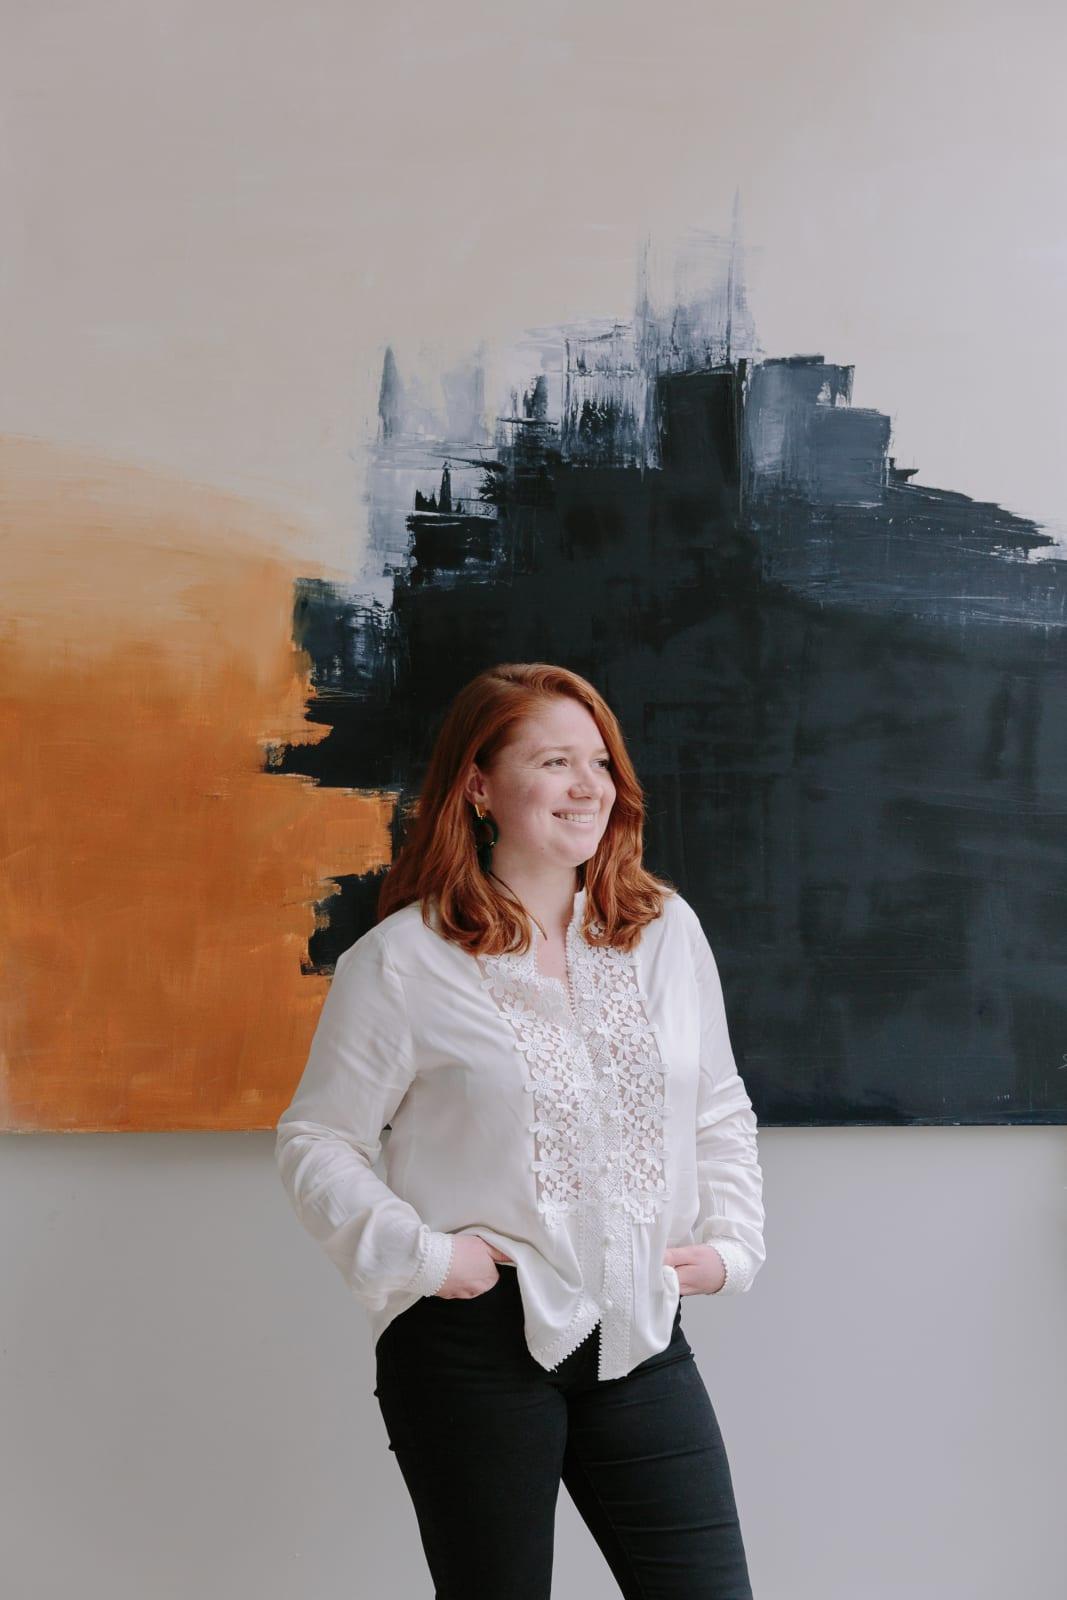 Astrid McKenny Engström | Associate Director